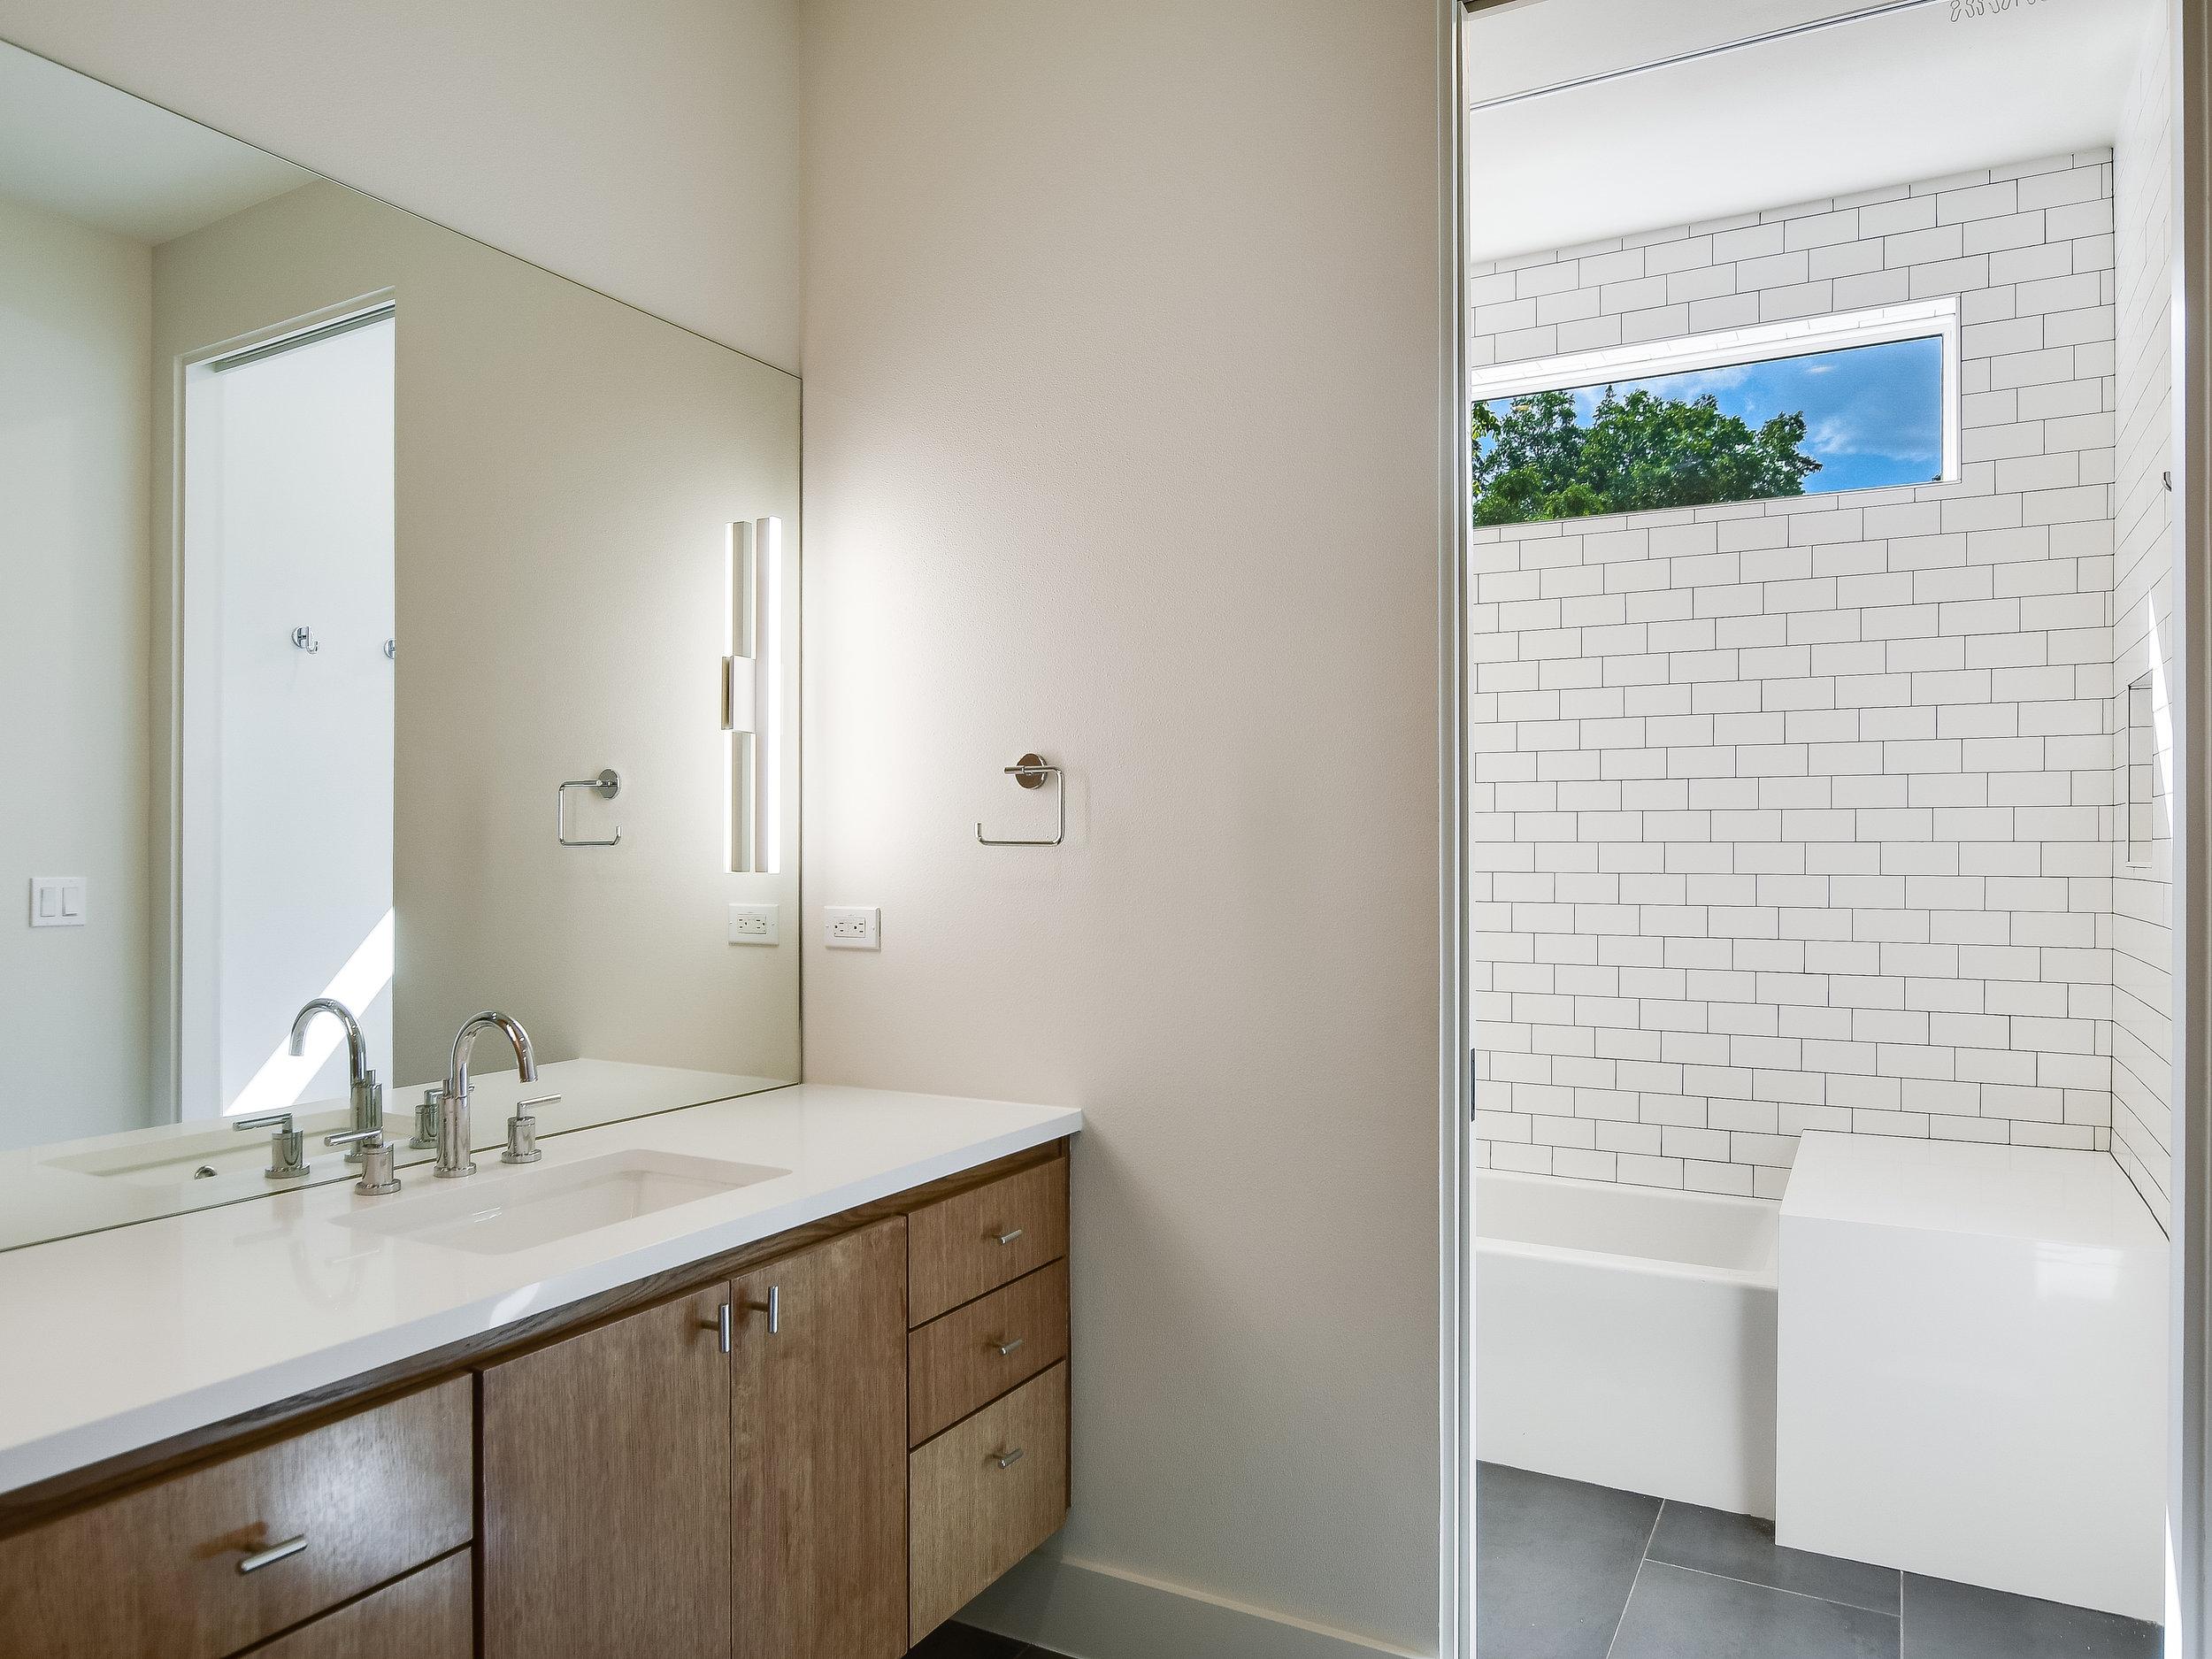 016_2nd Bathroom.jpg